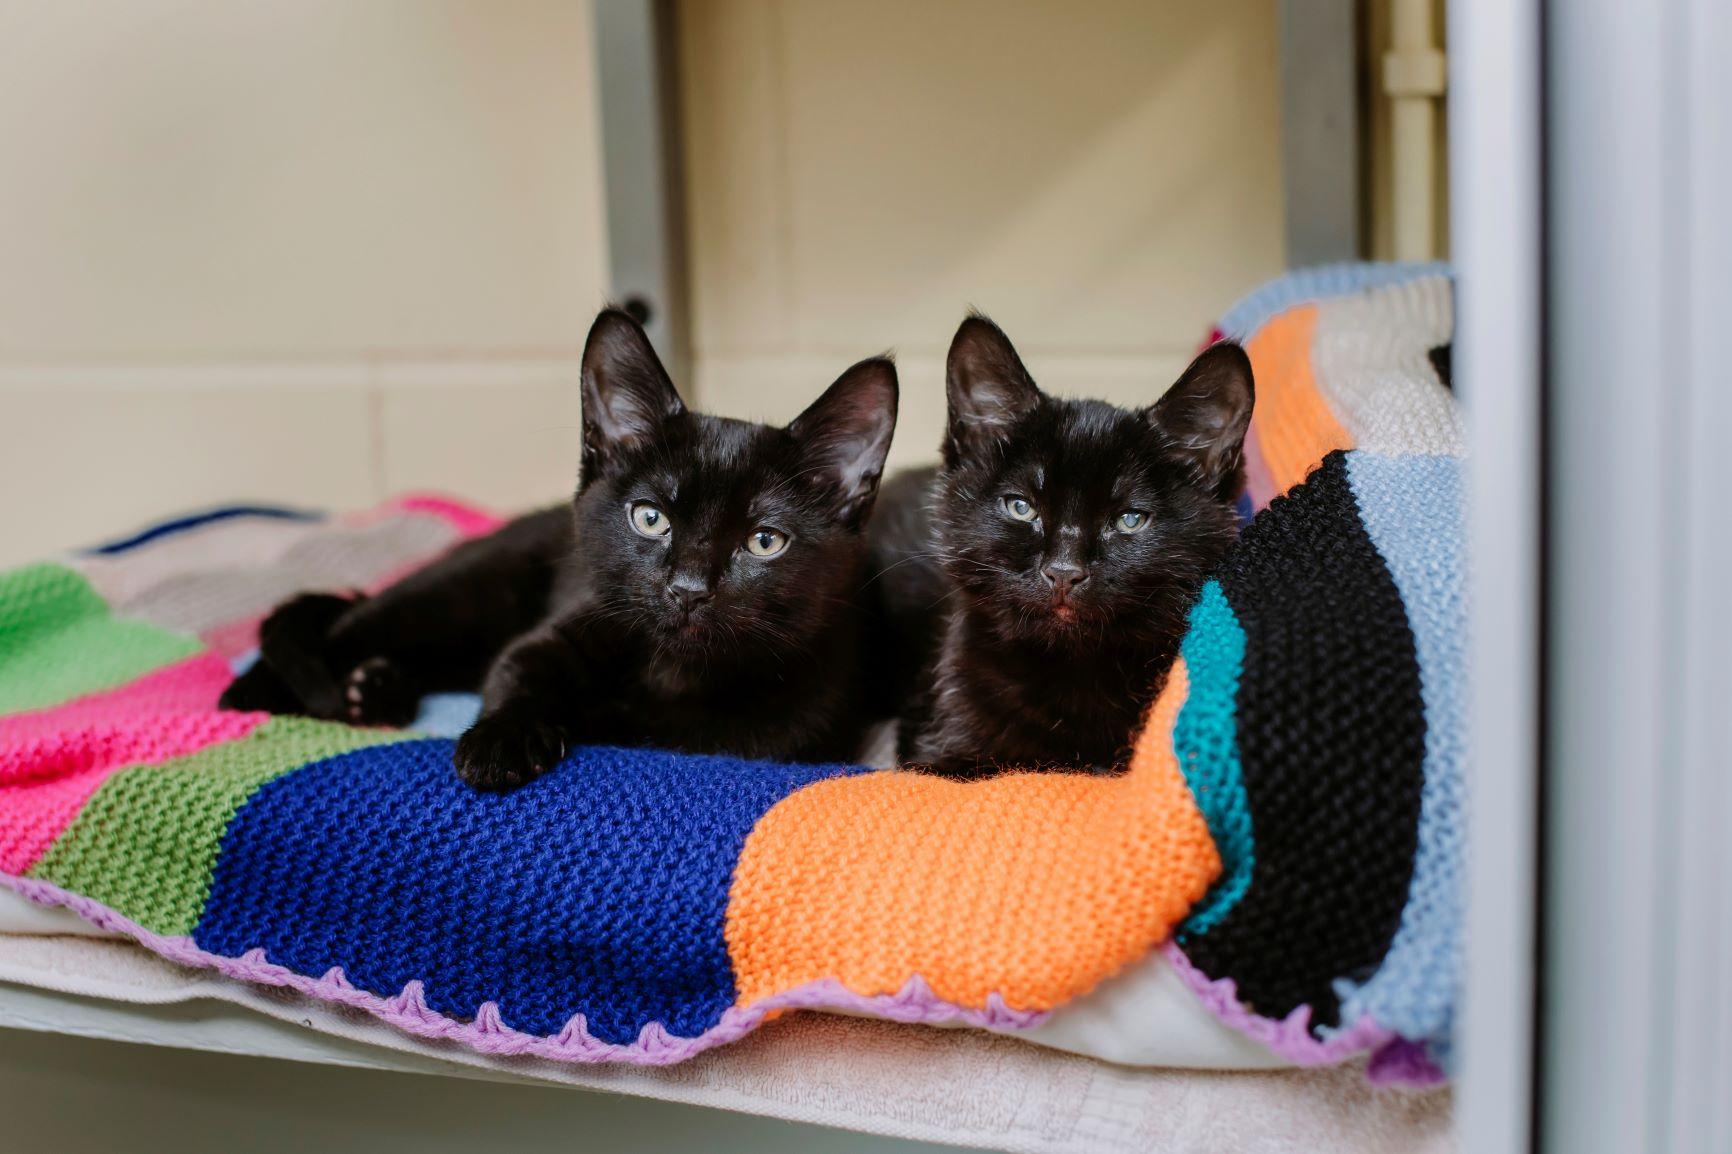 Tiny stray kitten saves sick brother's life